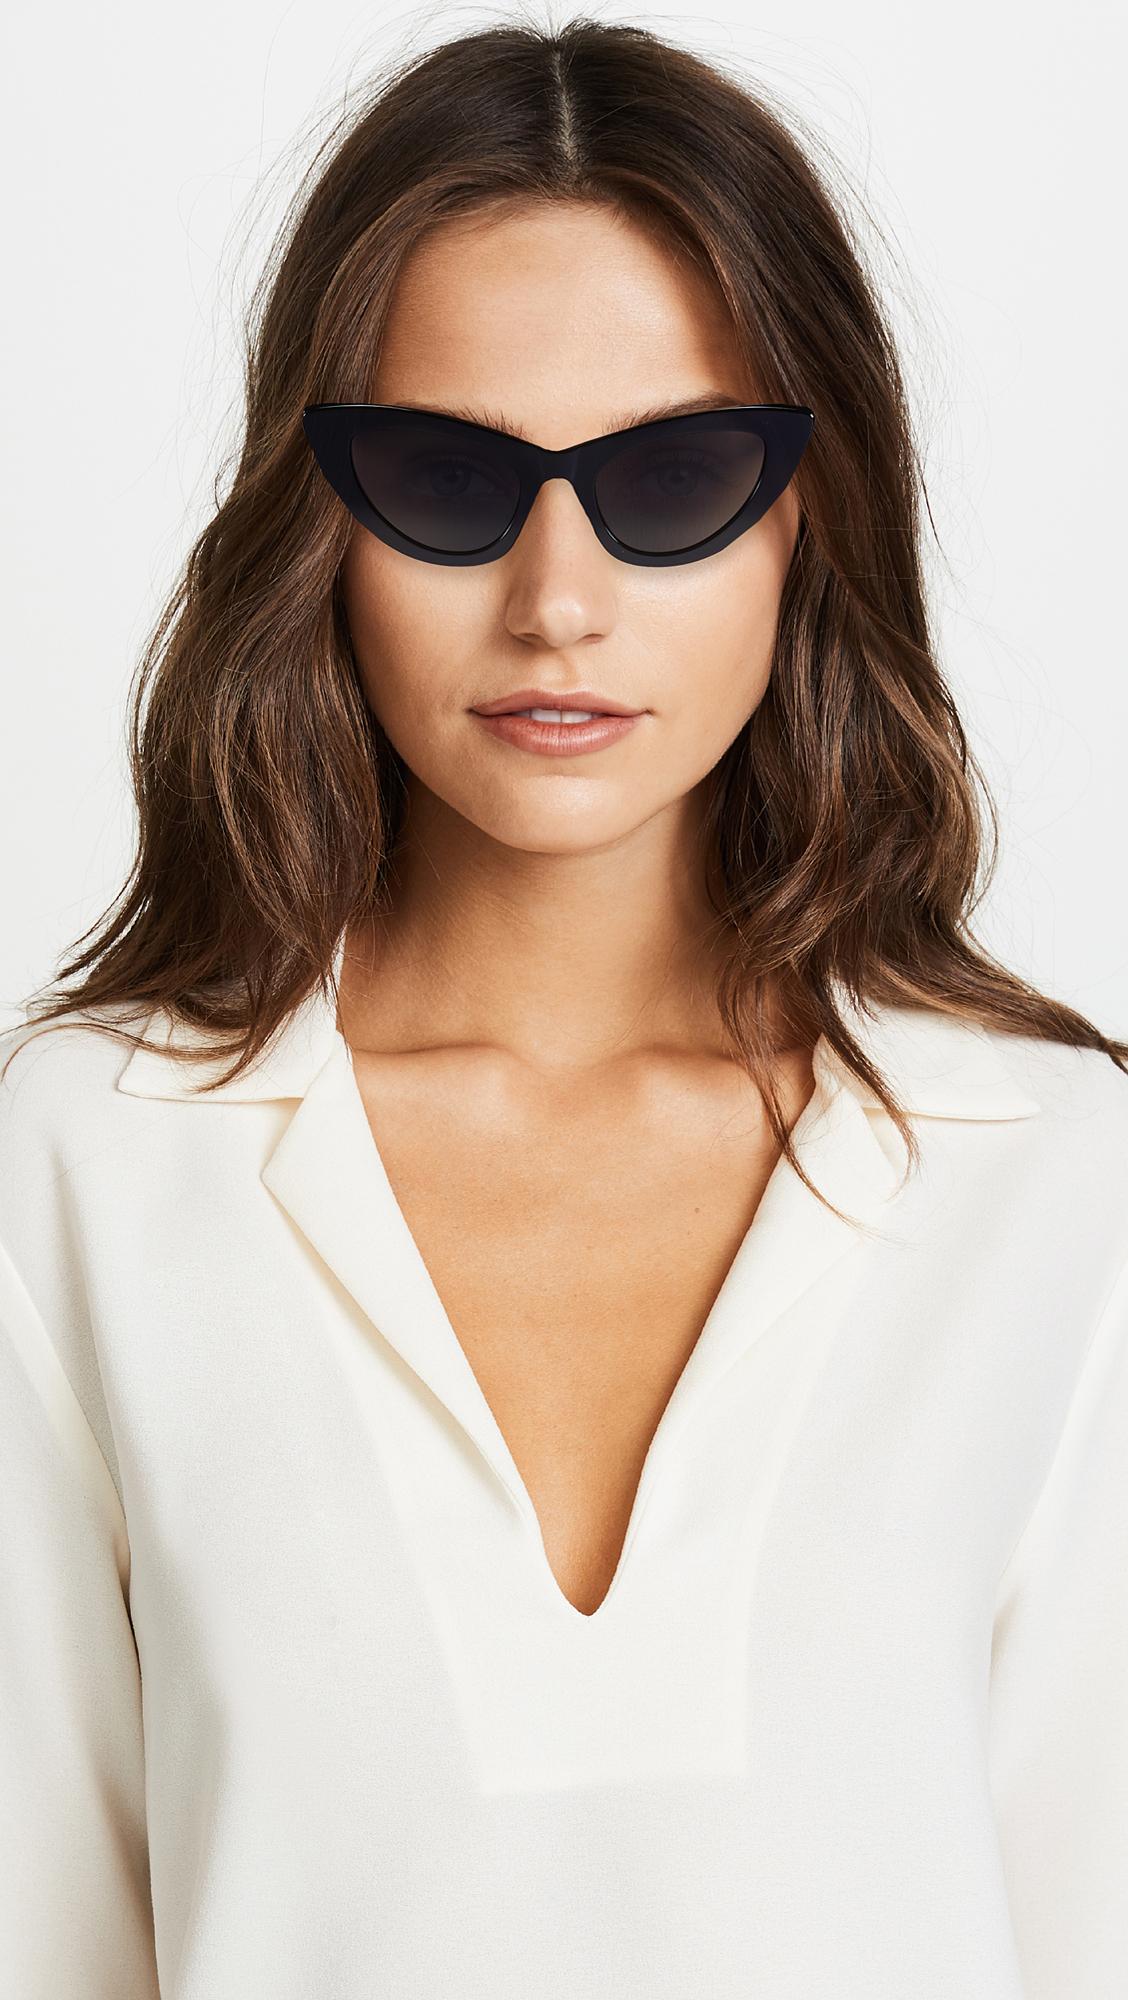 ef800eb632 Saint Laurent SL 213 Lily Sunglasses